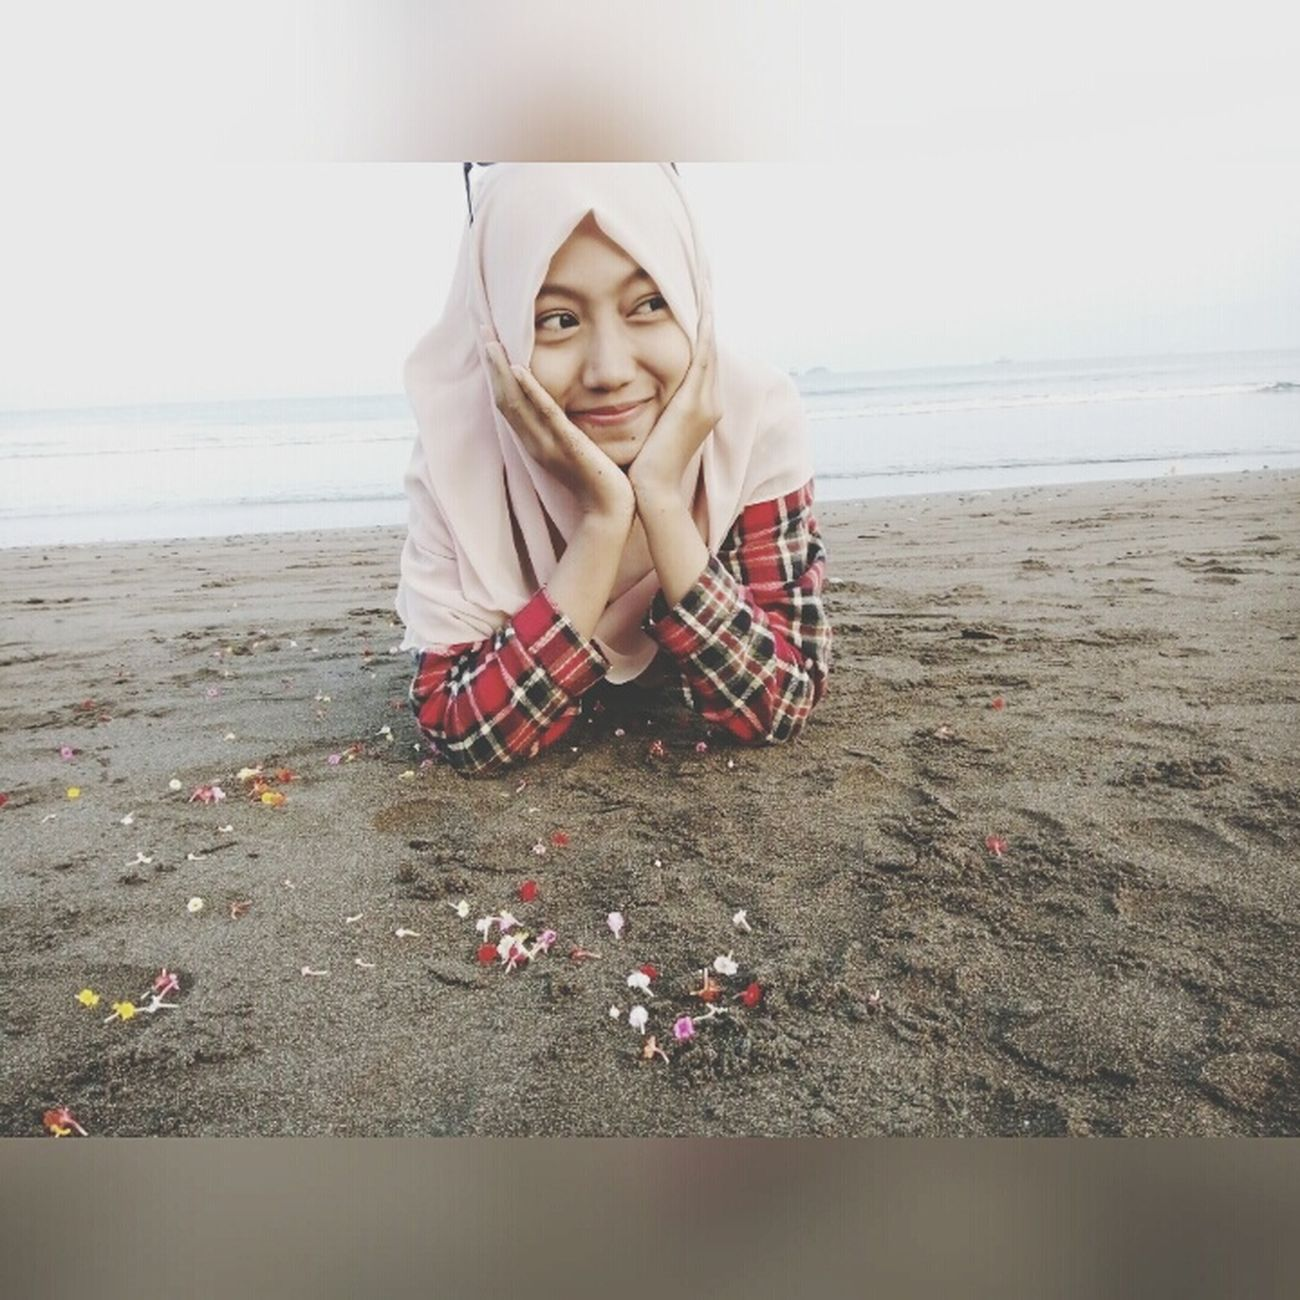 Beach Capture Opponeon5 Oppoindonesia Nsrii_smrn